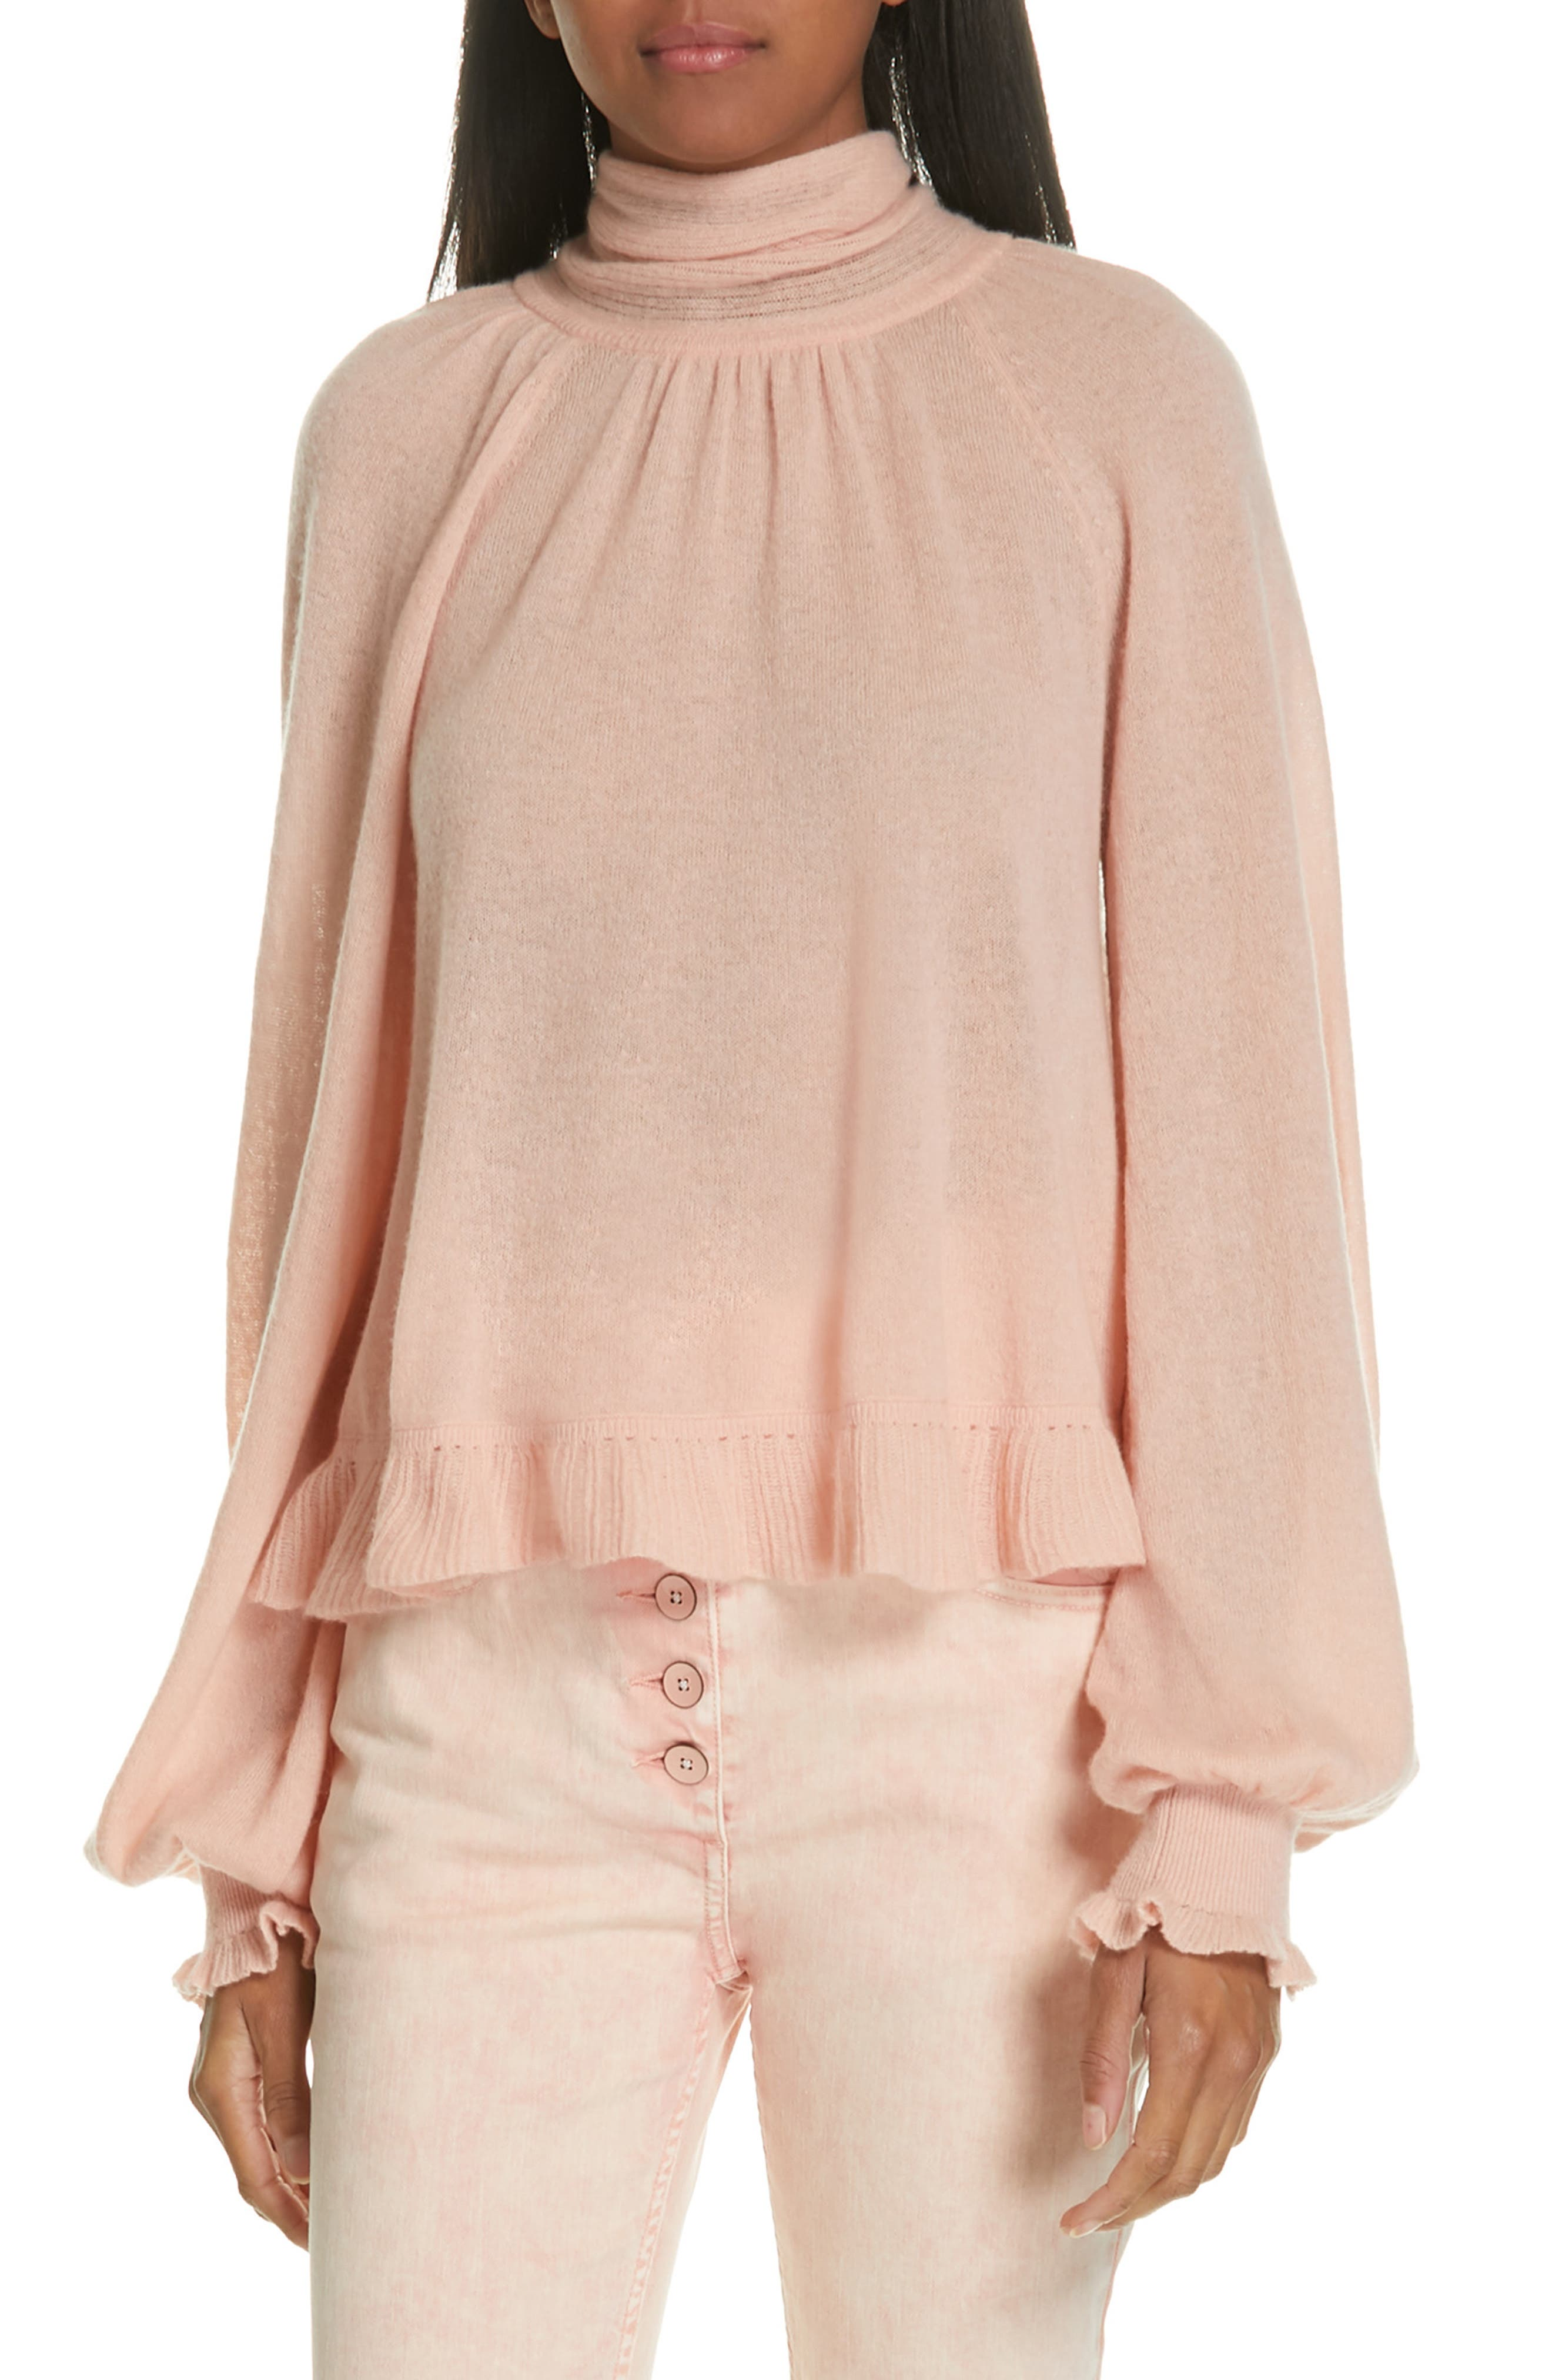 Clover Tie Back Cashmere Blend Sweater, Main, color, ROSE